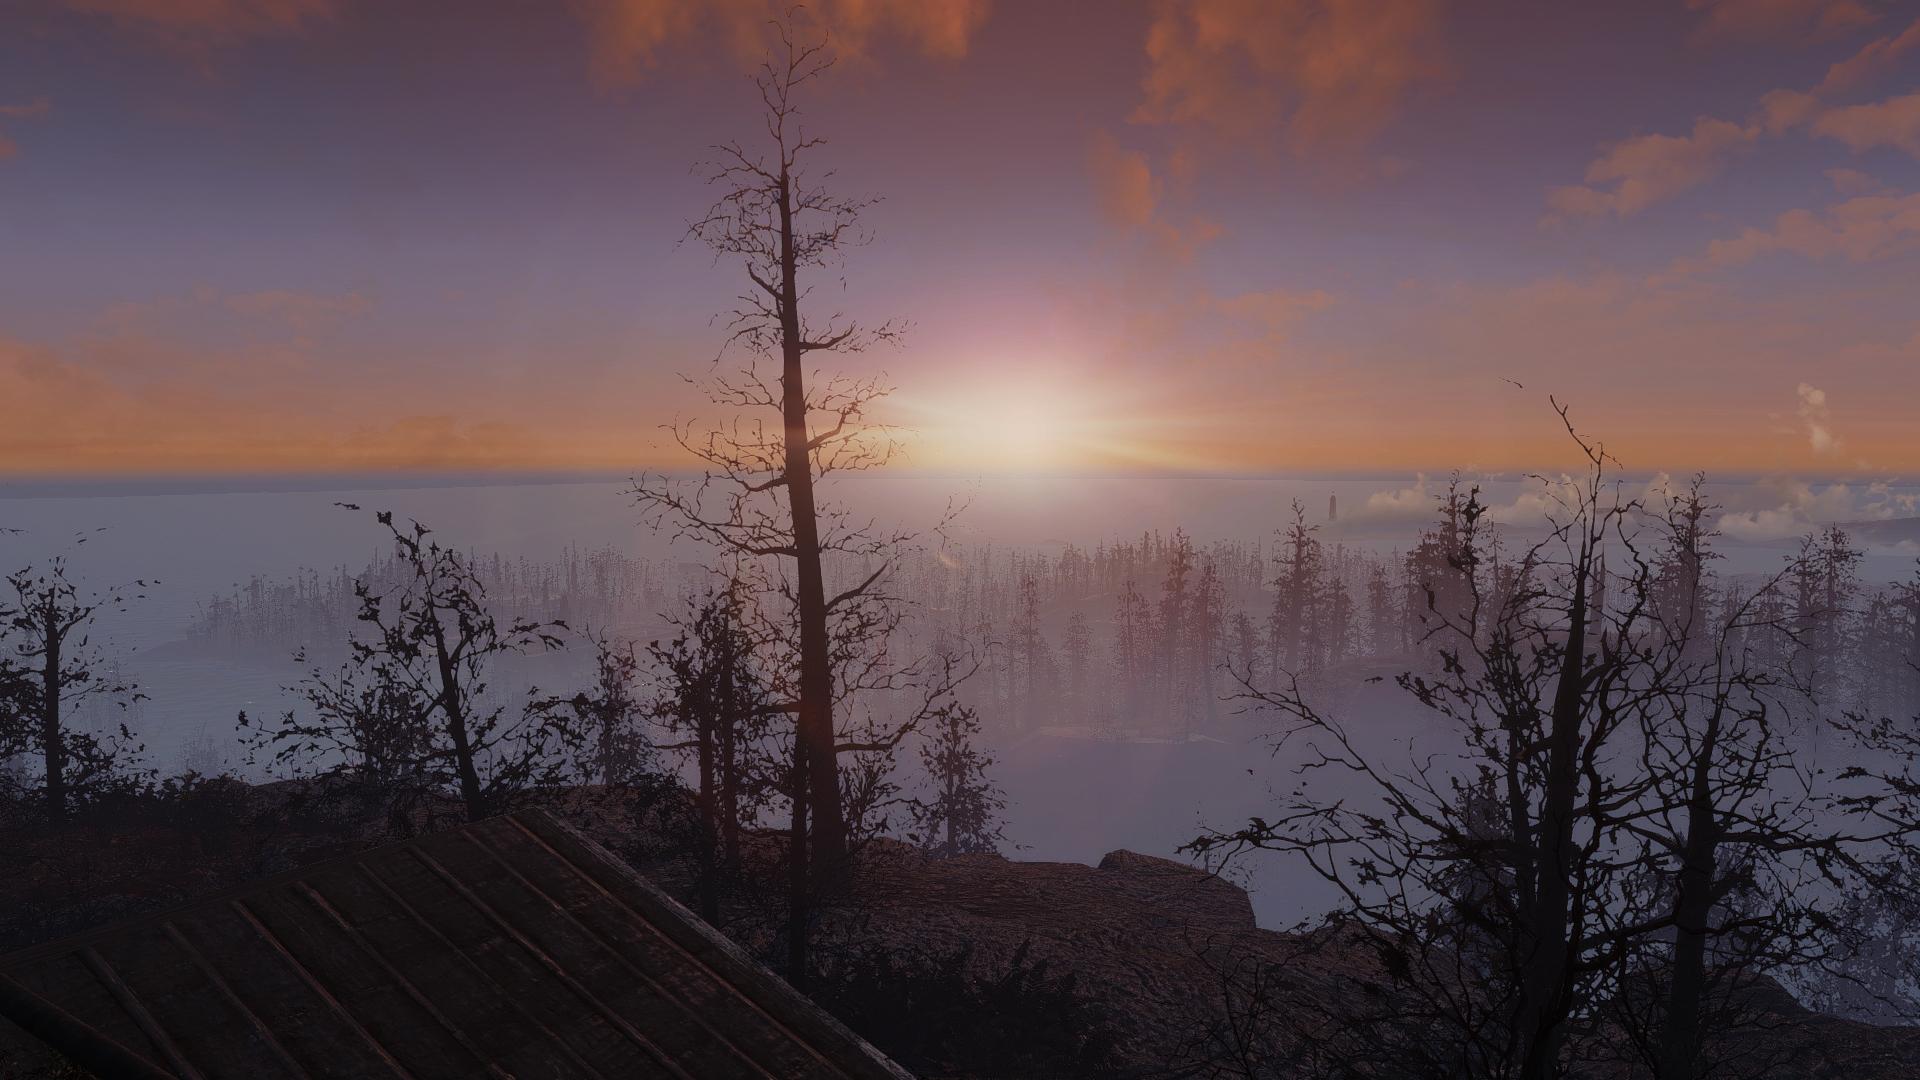 000776.Jpg - Fallout 4